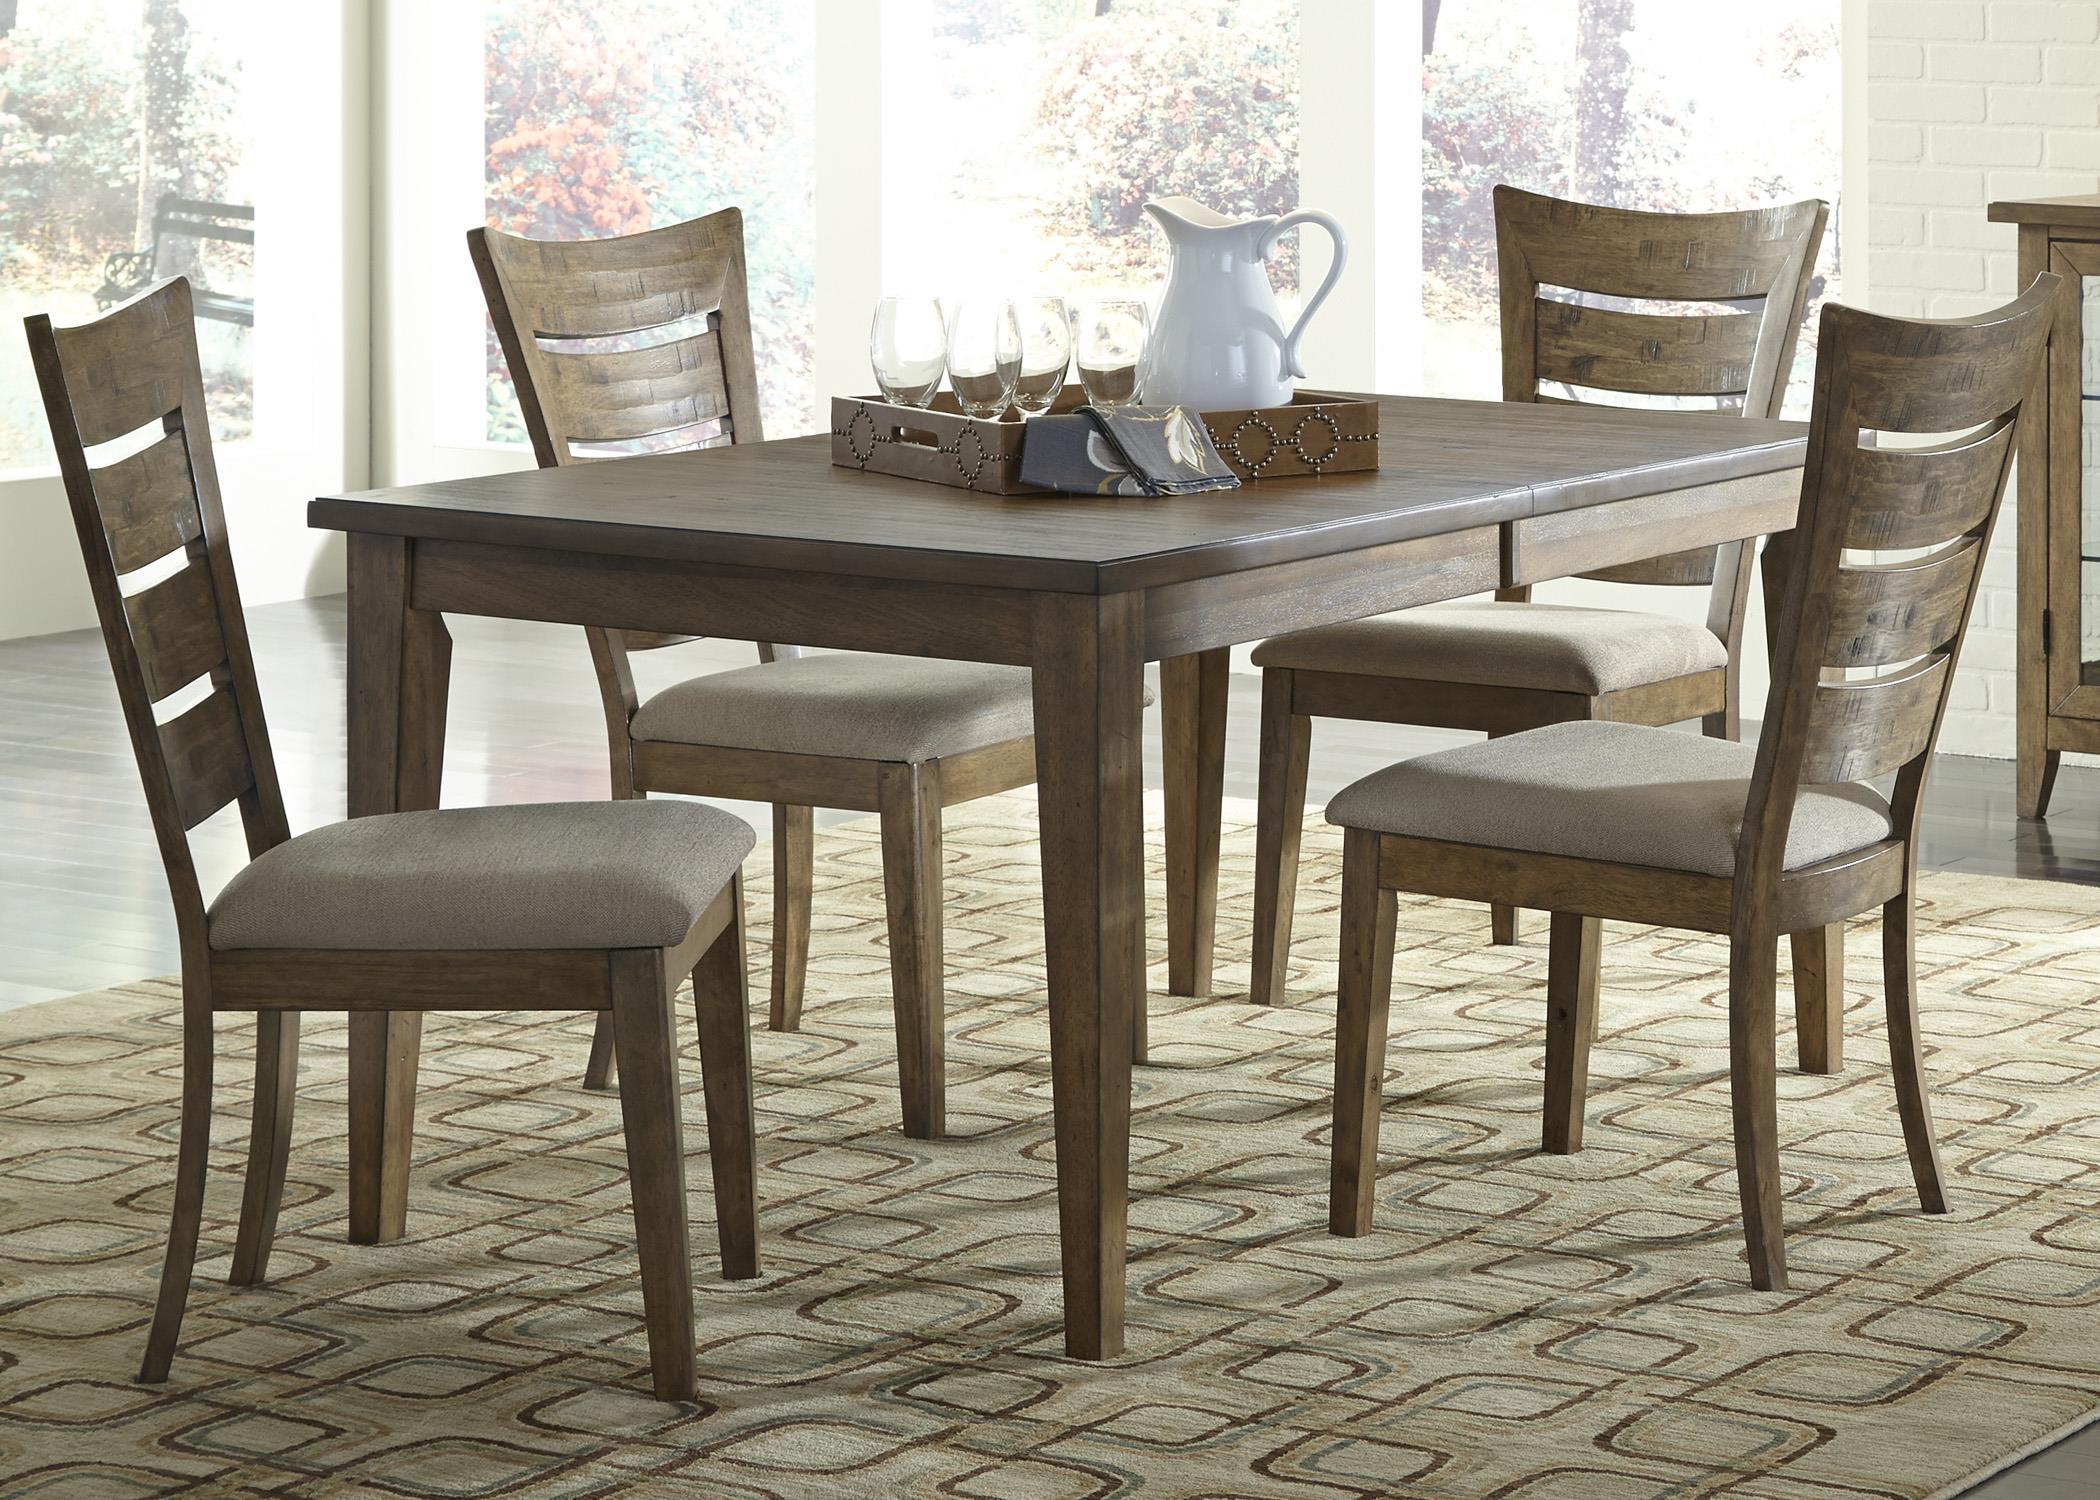 Liberty Furniture Pebble Creek 5 Piece Rectangular Table Set - Item Number: 376-CD-5RLS